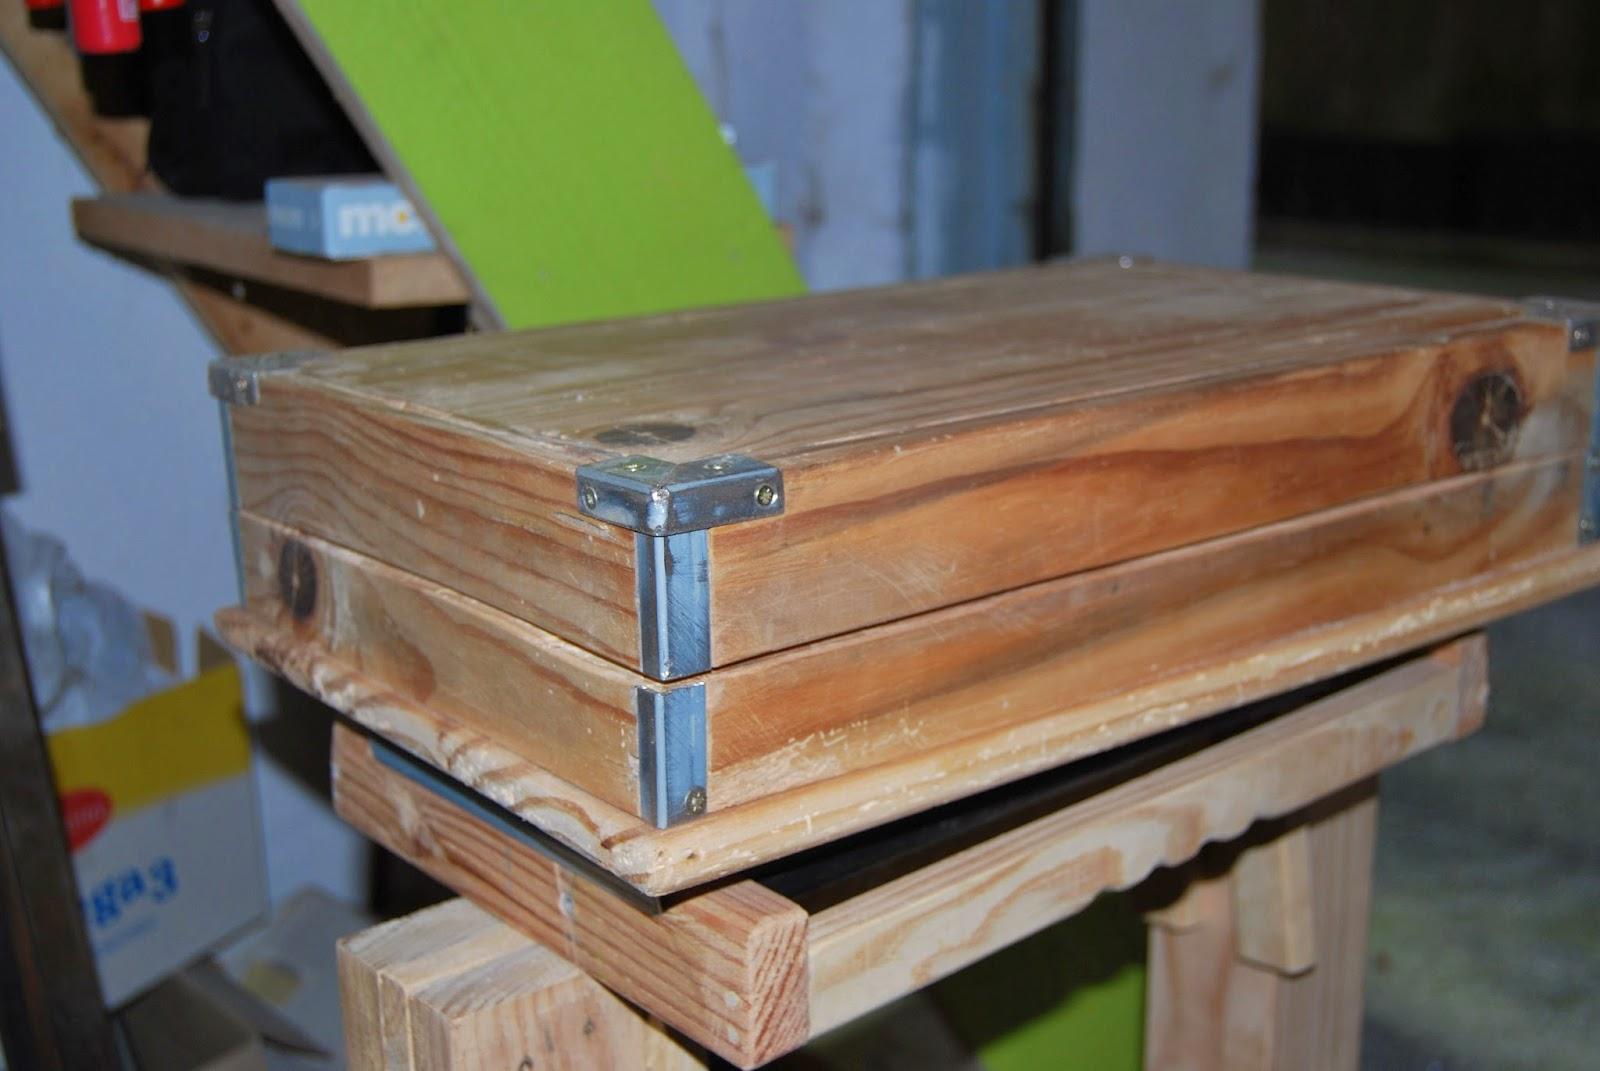 Como hacer caja de madera machiembrada con cantoneras recicladas.